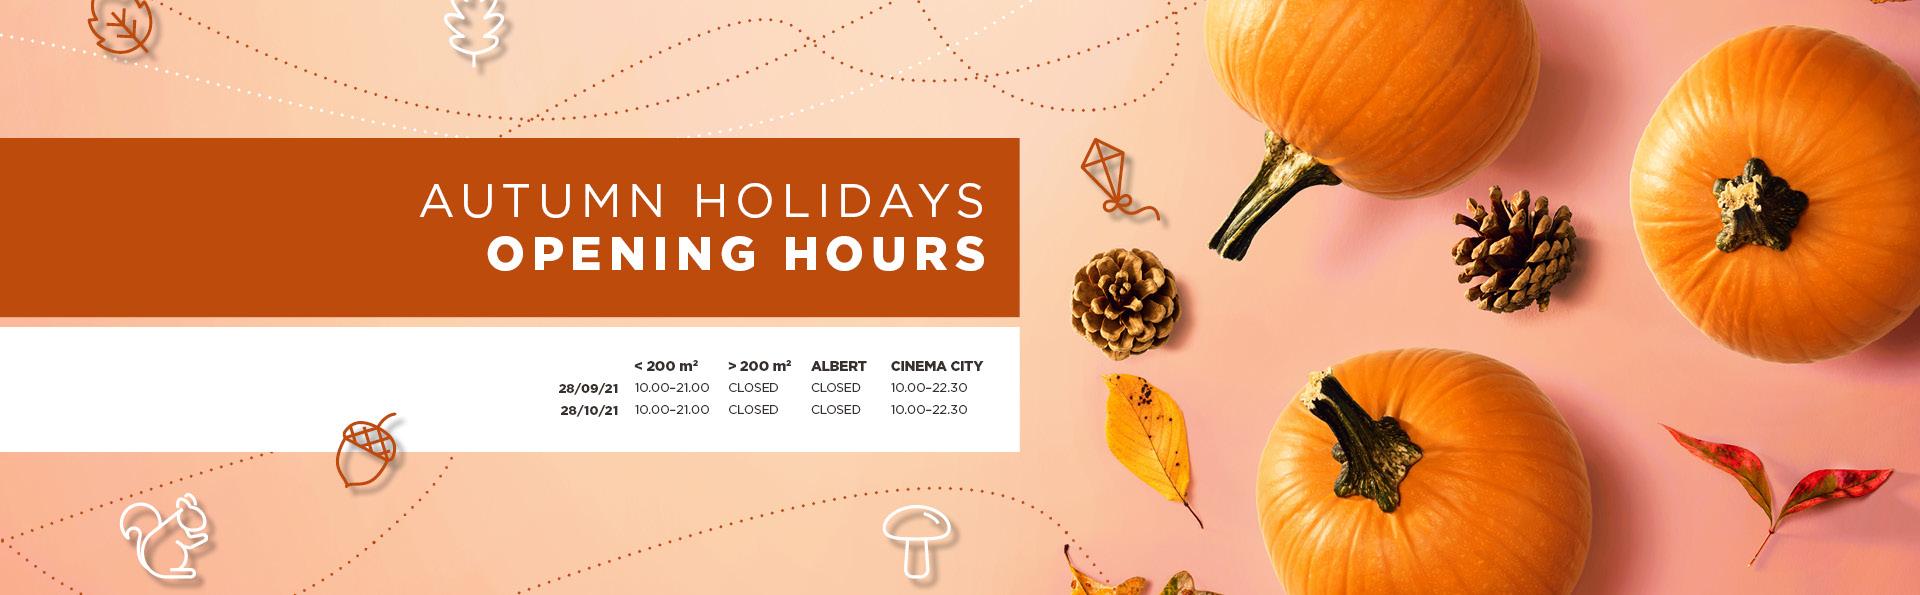 Autumn Holidays – Opening Hours